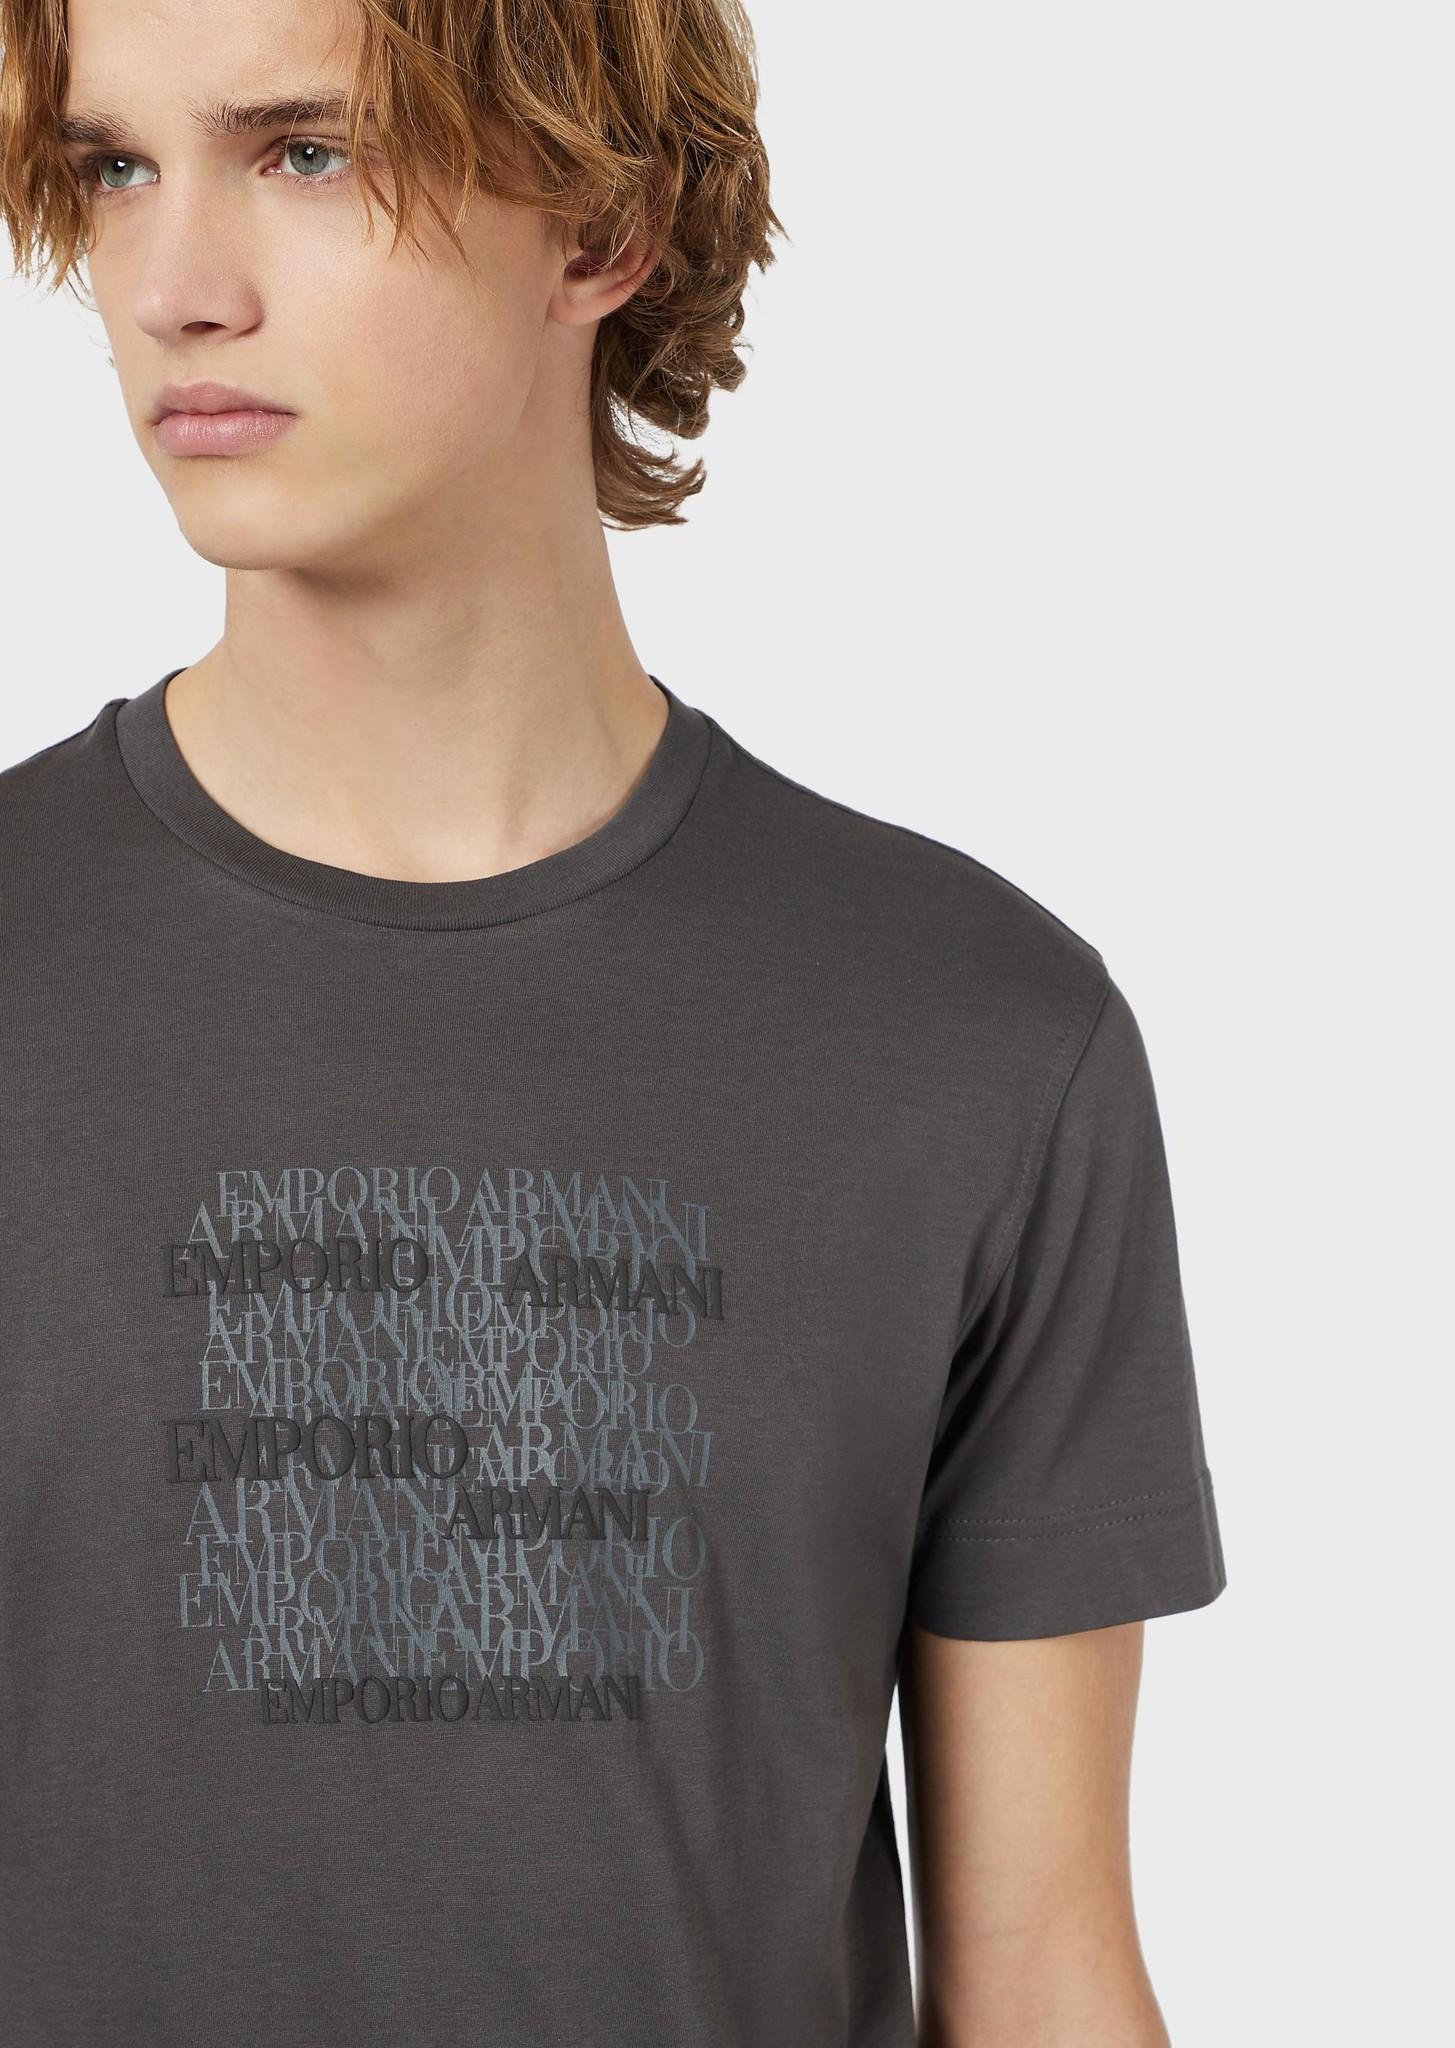 Emporio Armani T-shirt Emporio Armani 3K1TD6-1JSHZ-0679